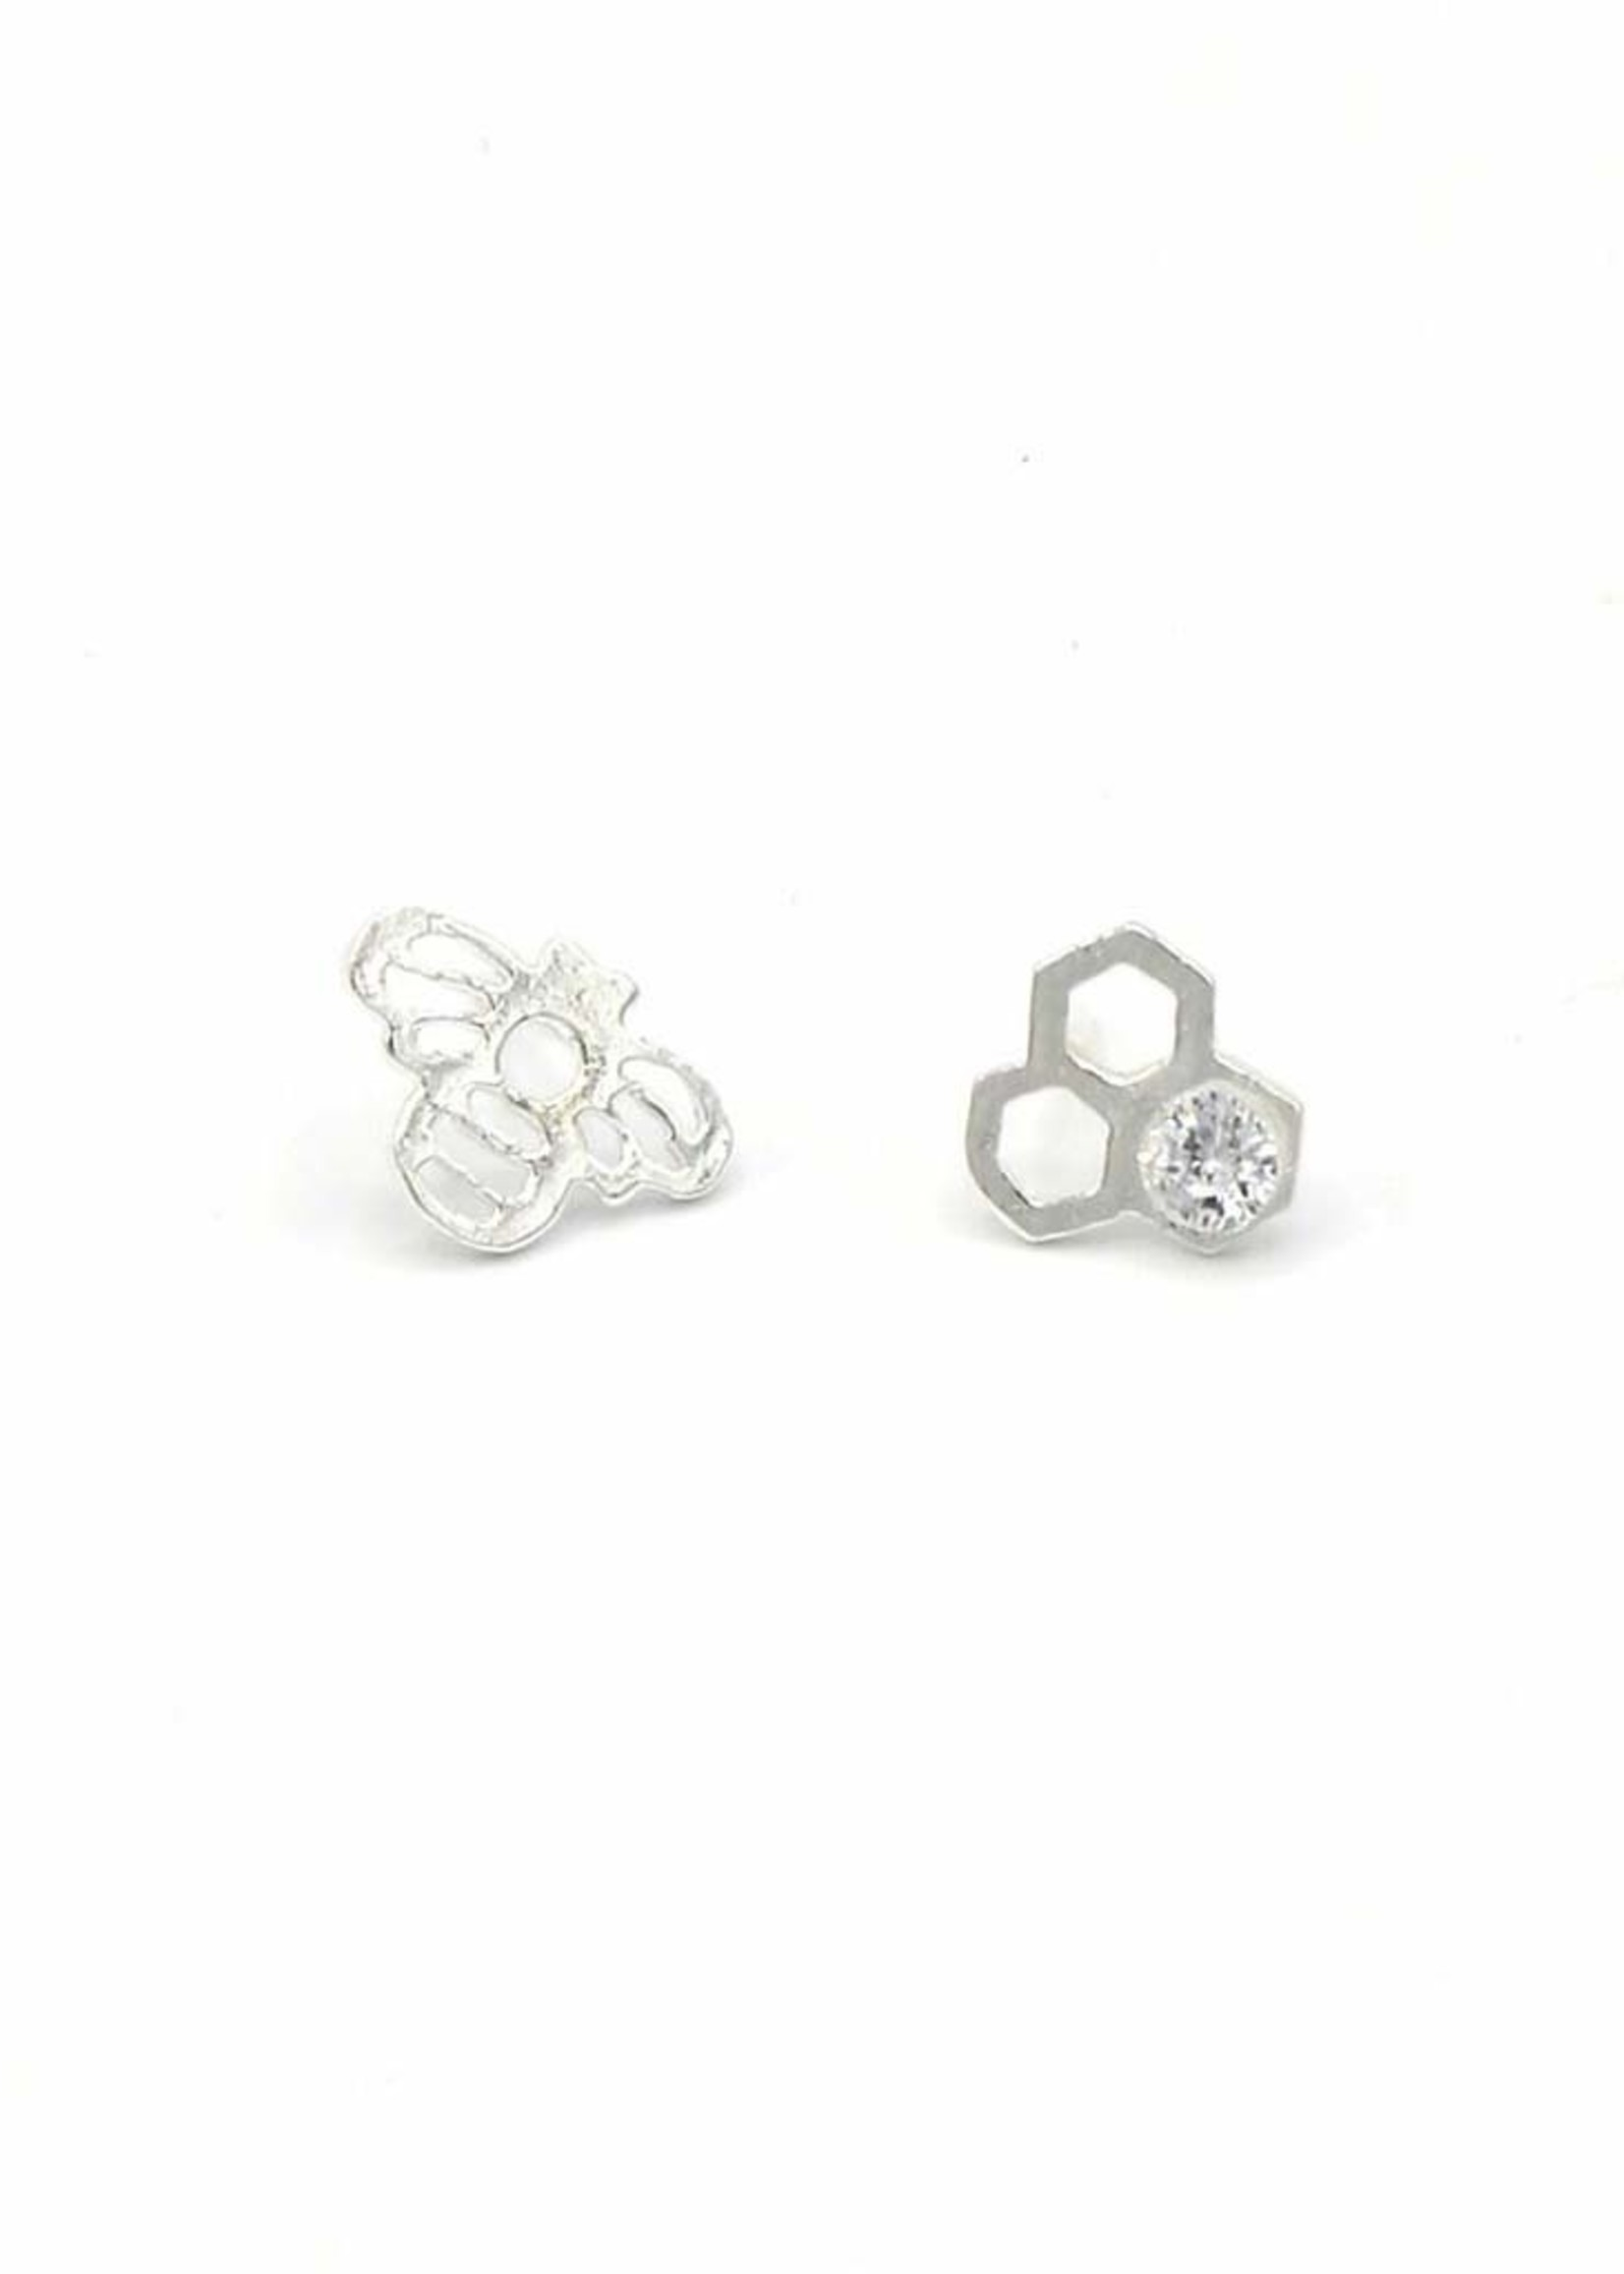 Honeycomb & Bee Stud Earrings